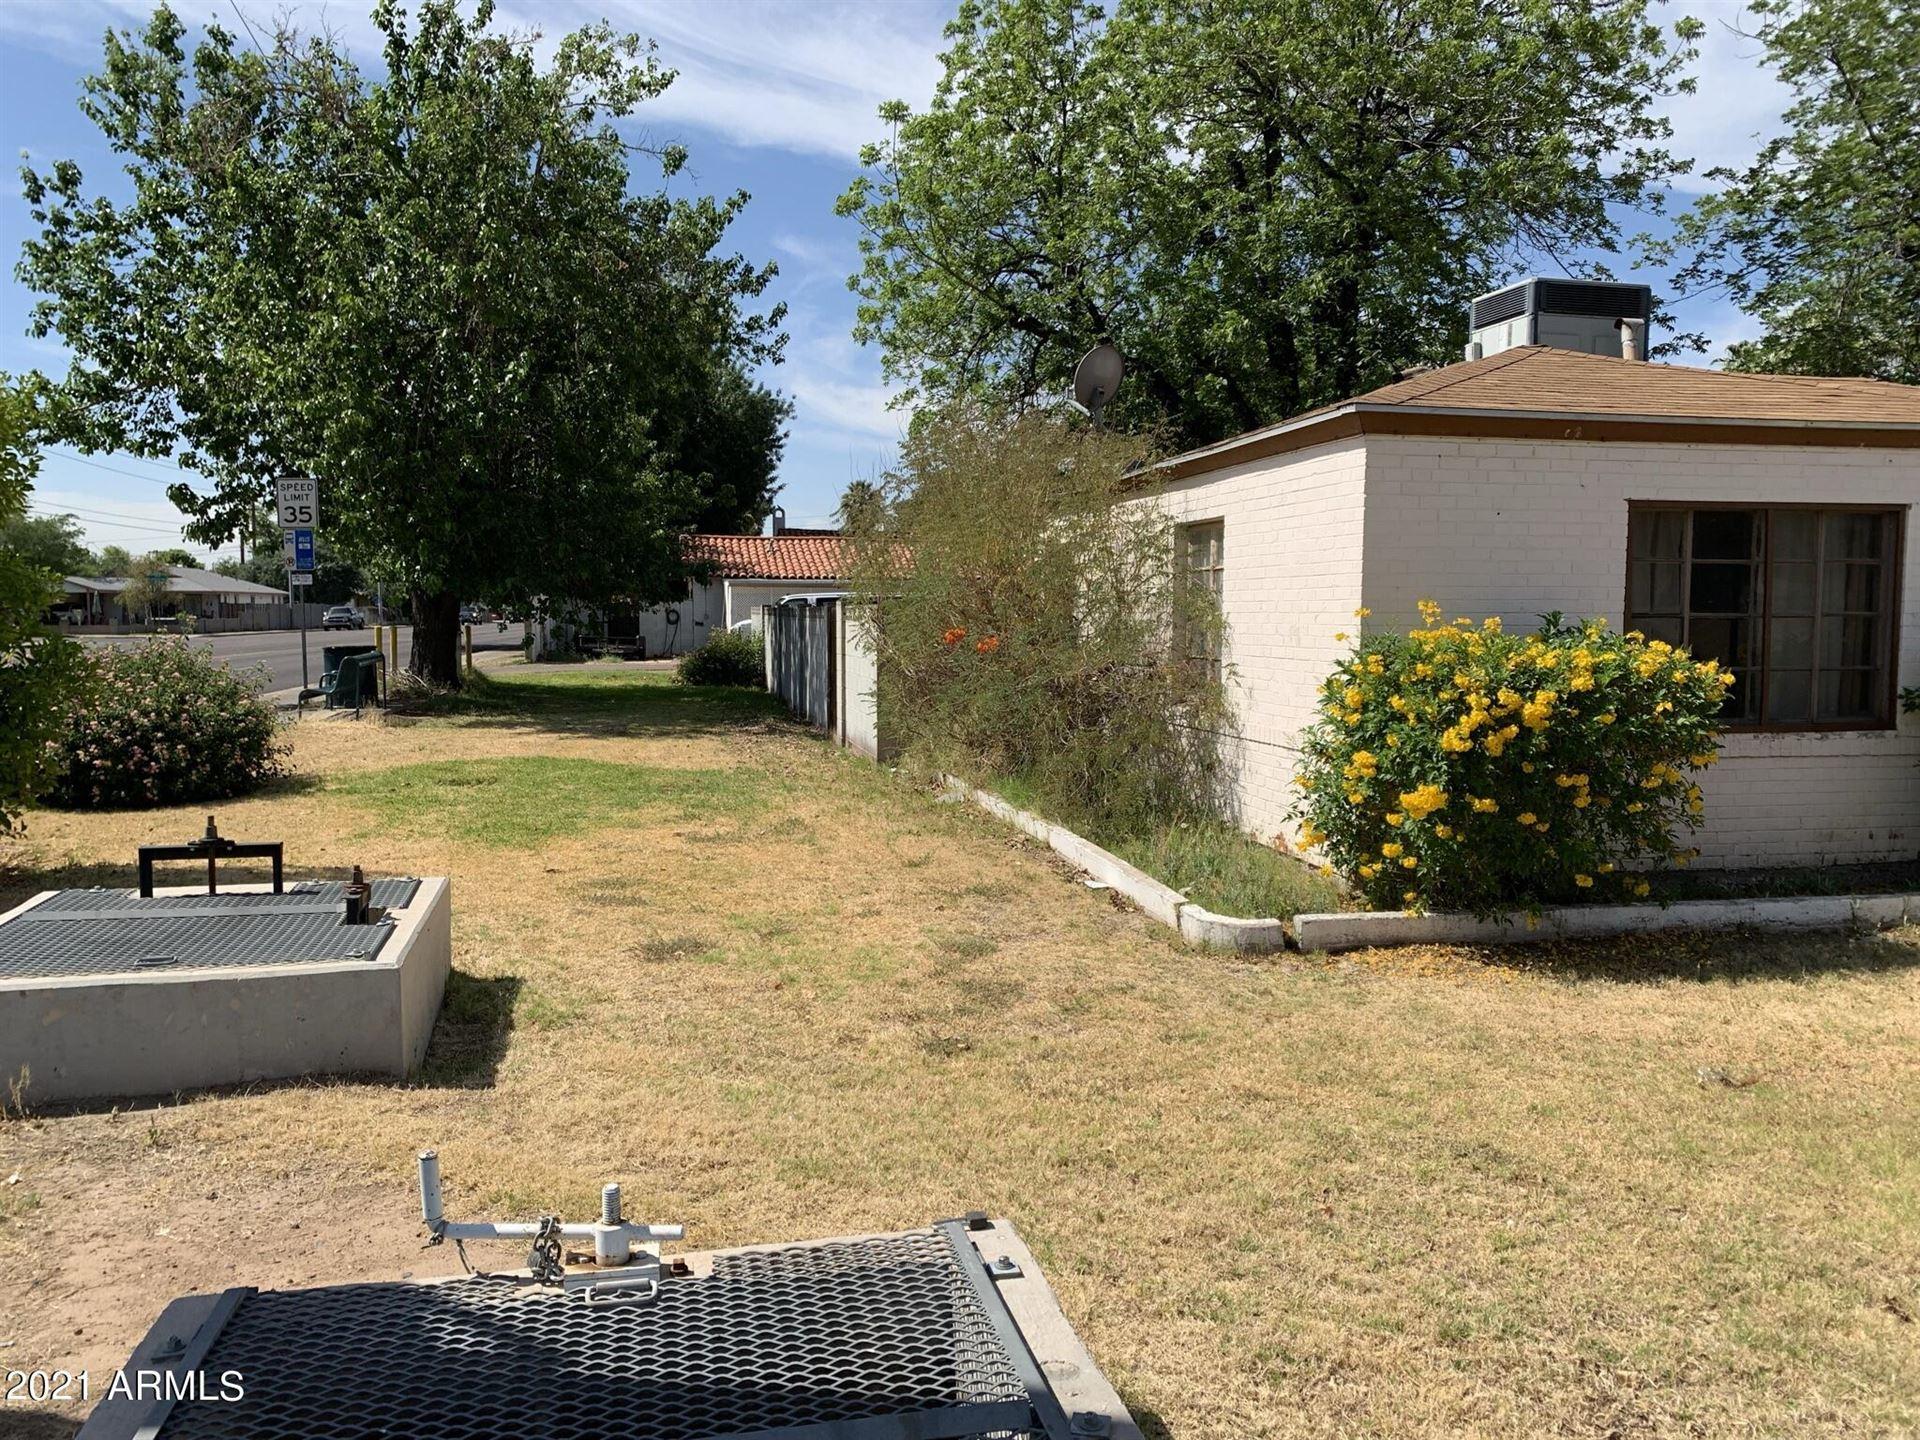 Photo of 5901 W ORANGEWOOD Avenue, Glendale, AZ 85301 (MLS # 6231645)